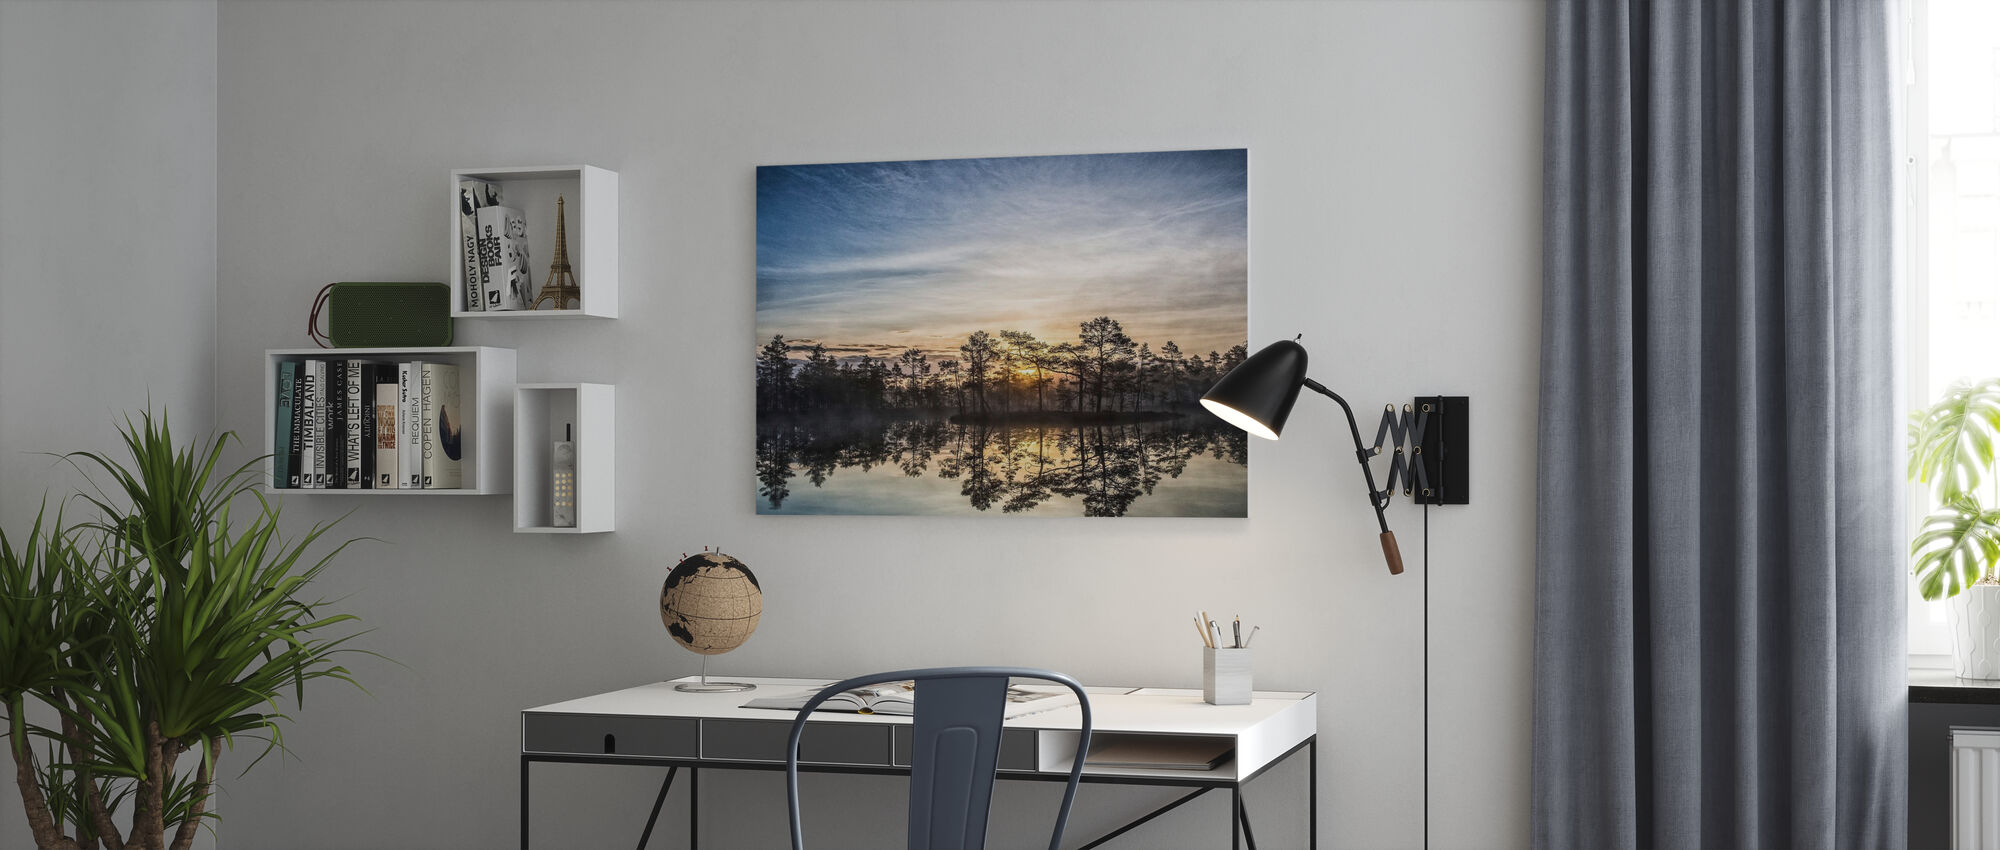 Lake in Hällefors - Sweden - Canvastavla - Kontor